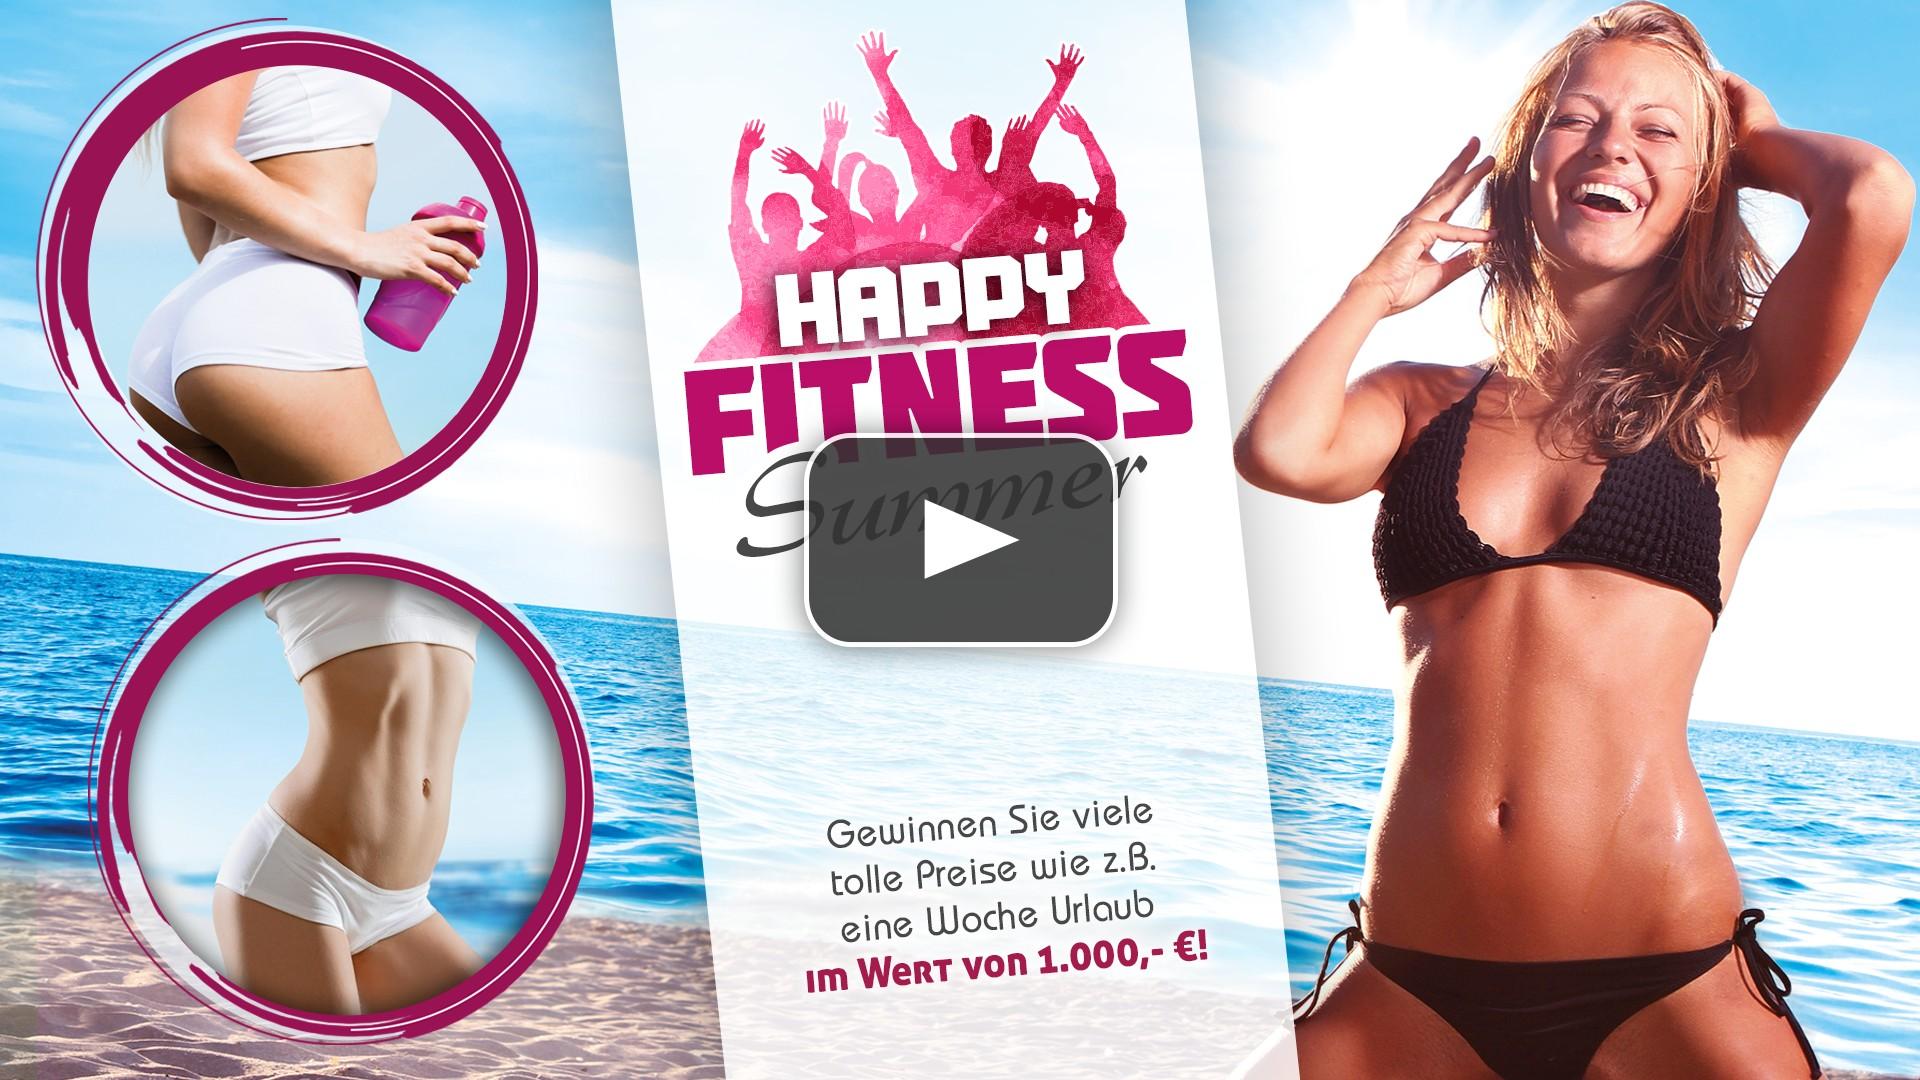 FIVE_Fitnesstreff_Veitsbronn_Werbe-Video_Startbild